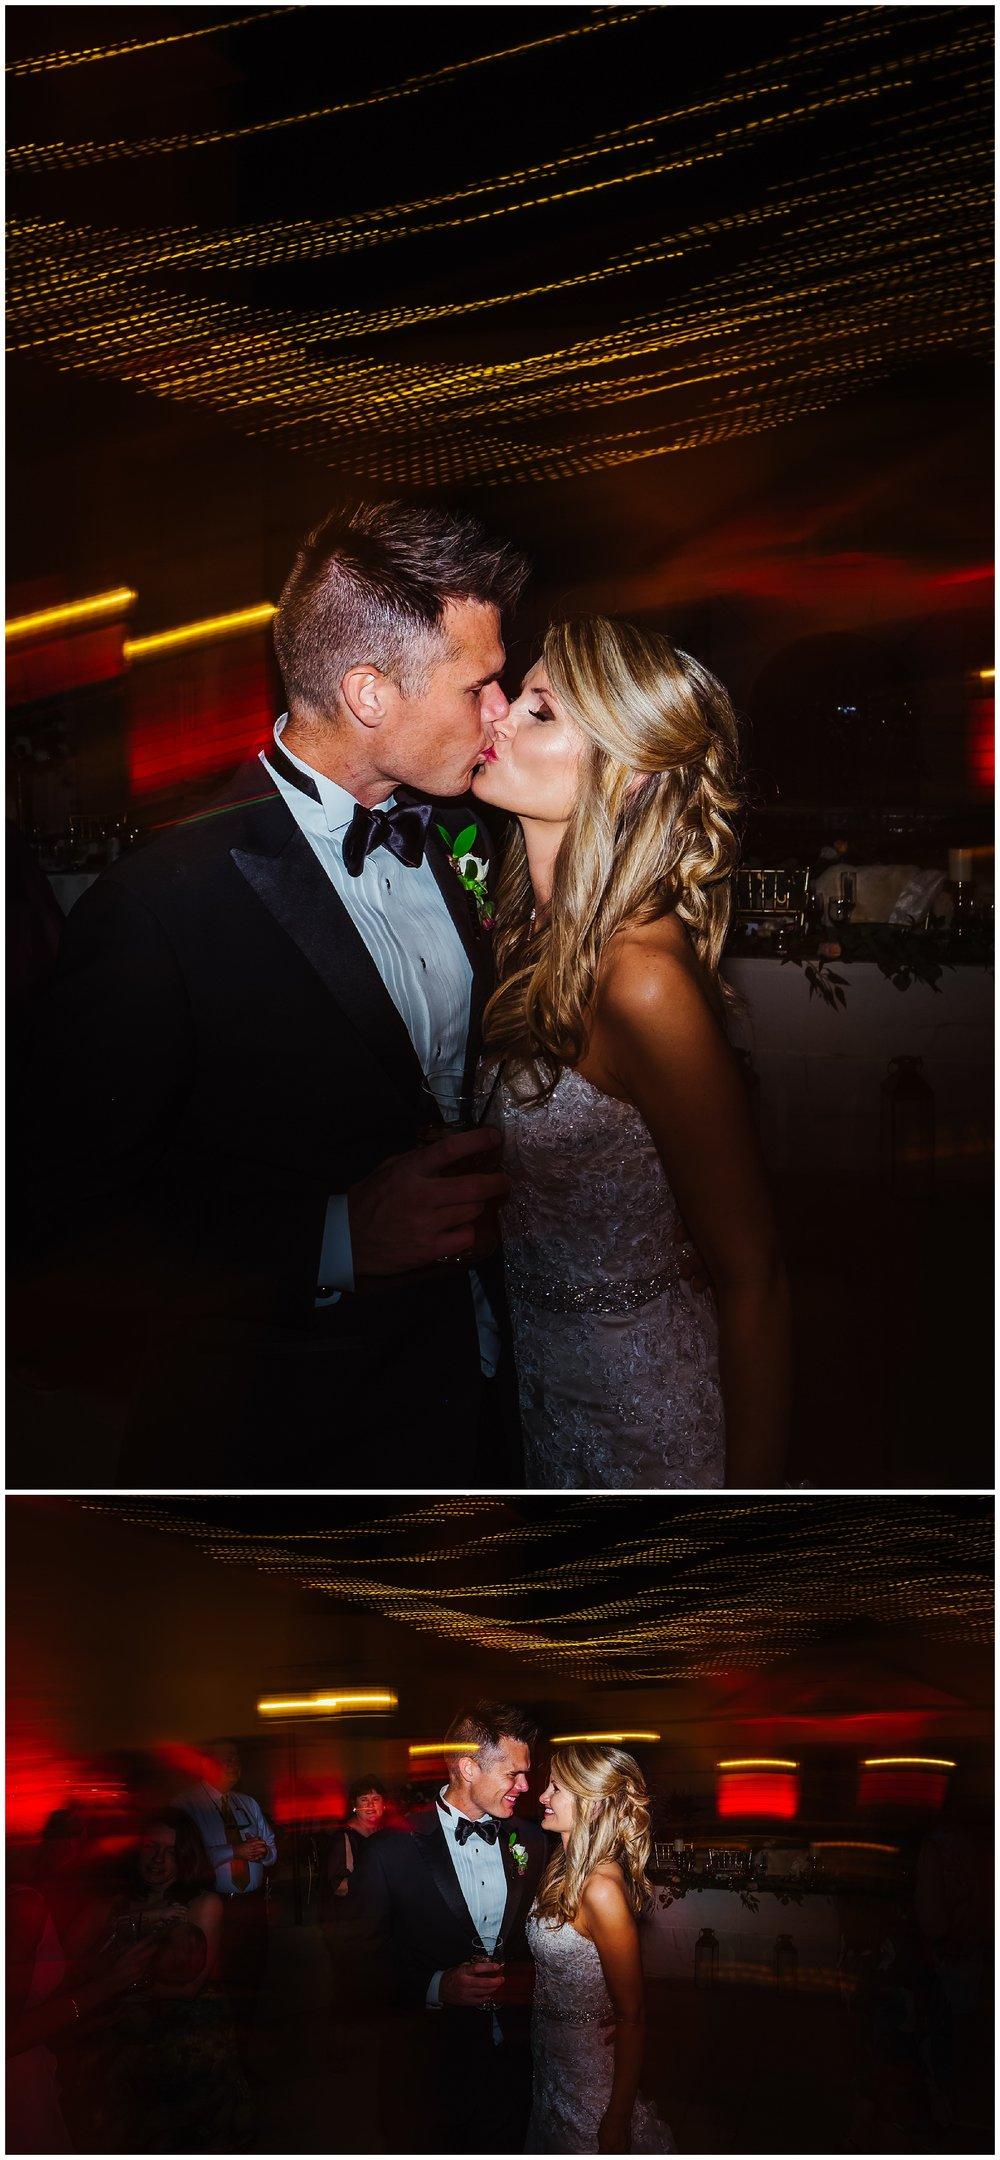 tampa-bradenton-wedding-photographer-south-florida-museum-classic-blush-gold-alpacas-sparklers_0085.jpg